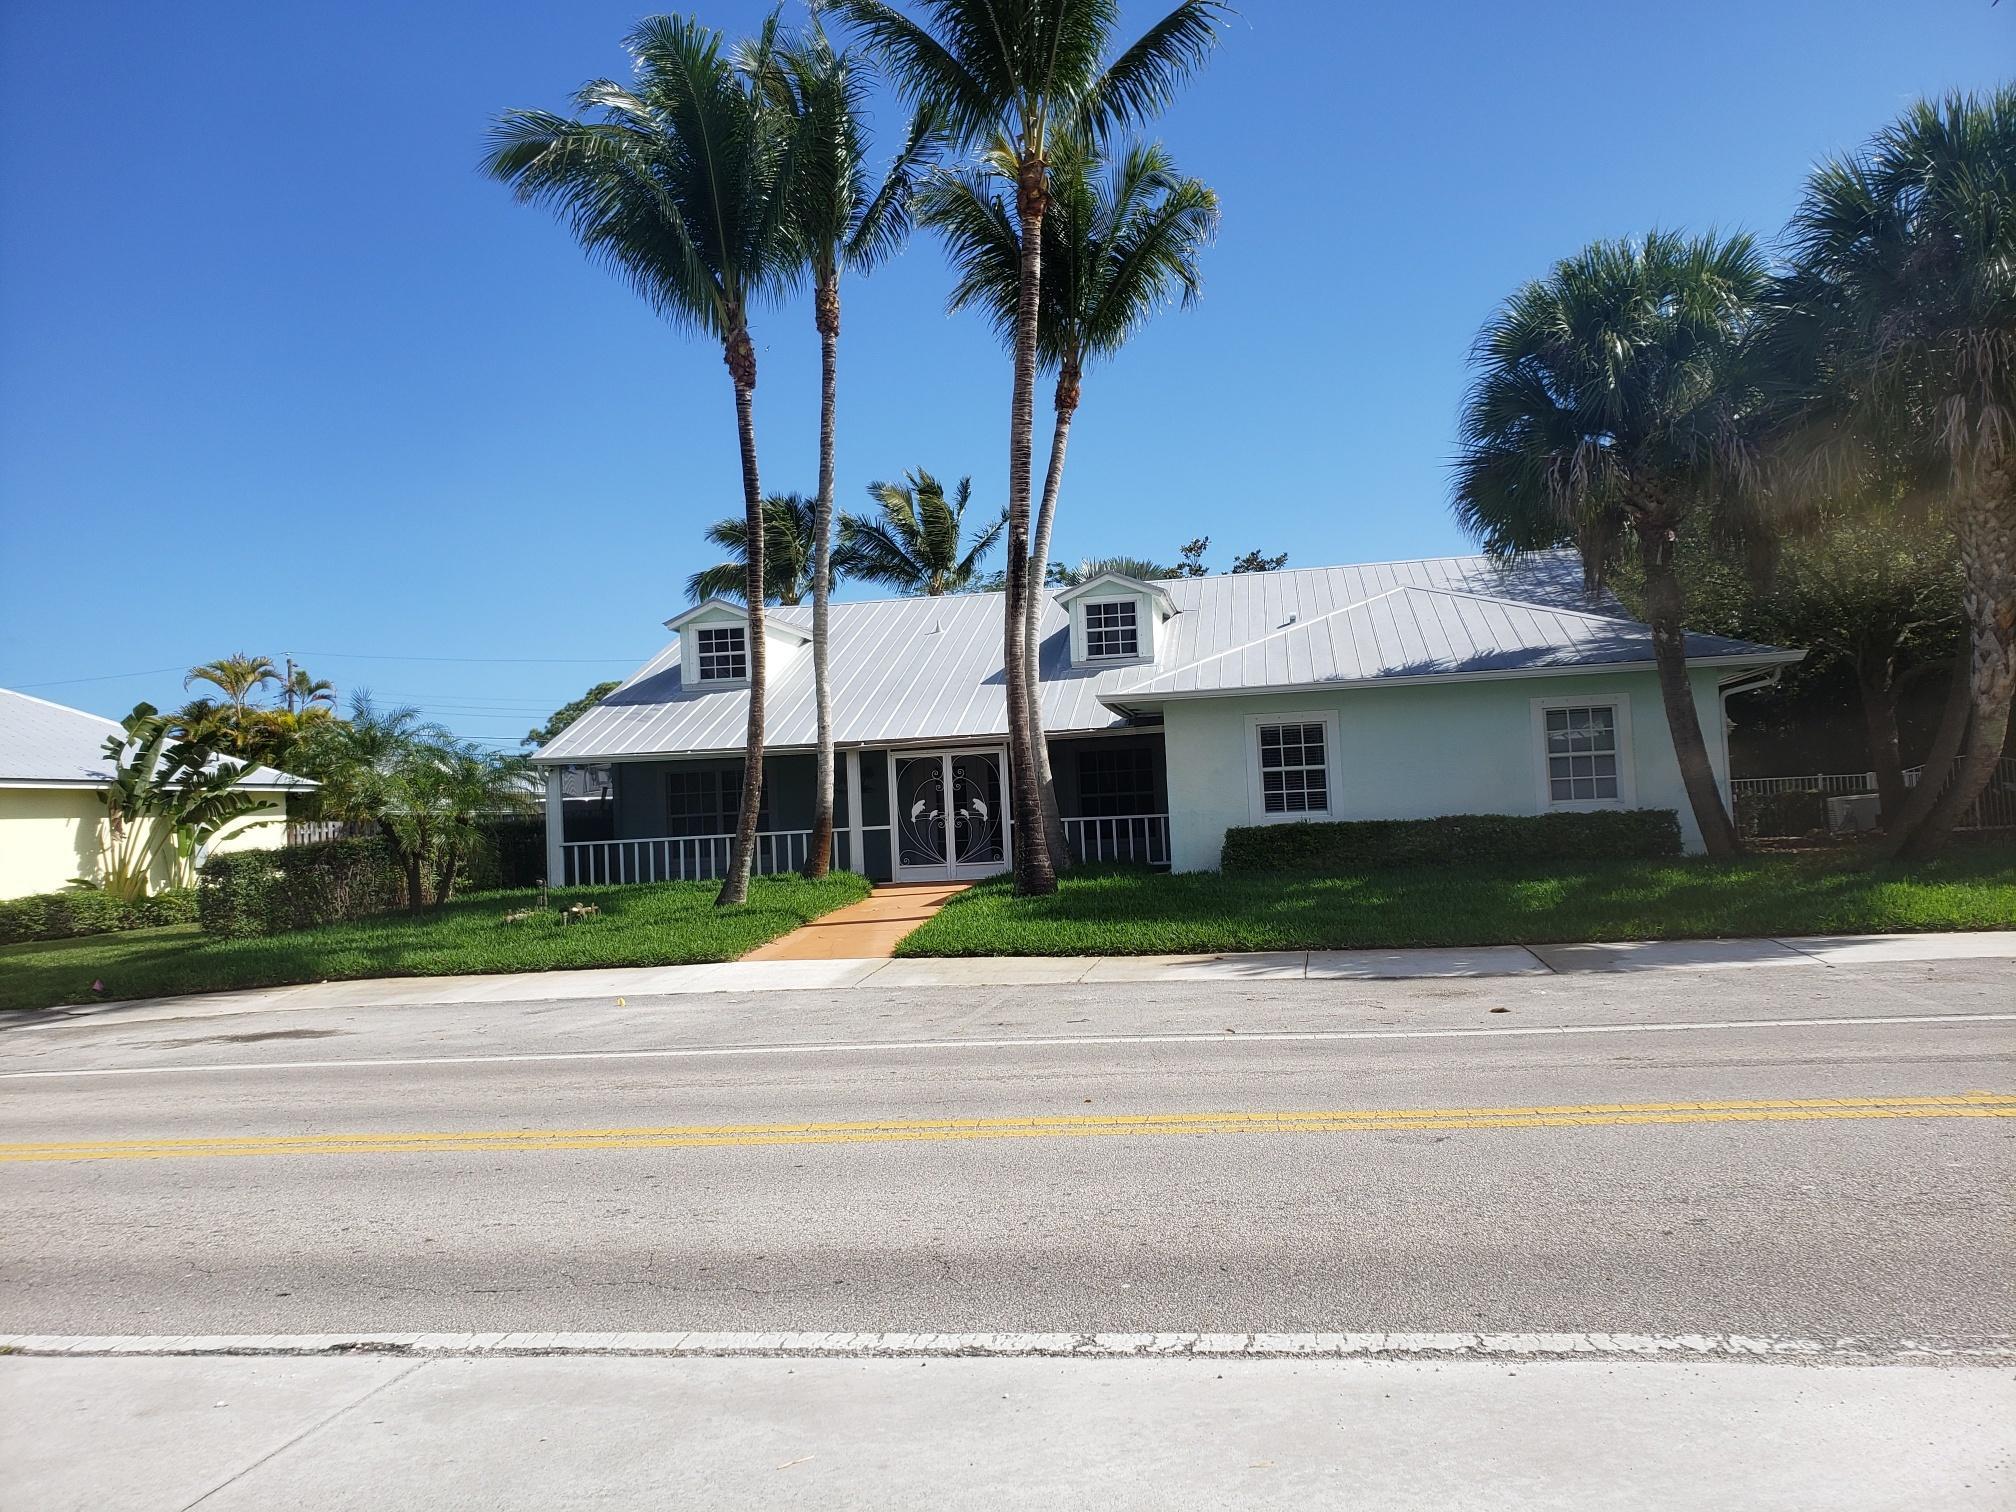 4931 SE Anchor Avenue, Stuart, Florida 34997, 6 Bedrooms Bedrooms, ,6 BathroomsBathrooms,Single Family,For Sale,4931 SE Anchor Avenue,1,RX-10695514